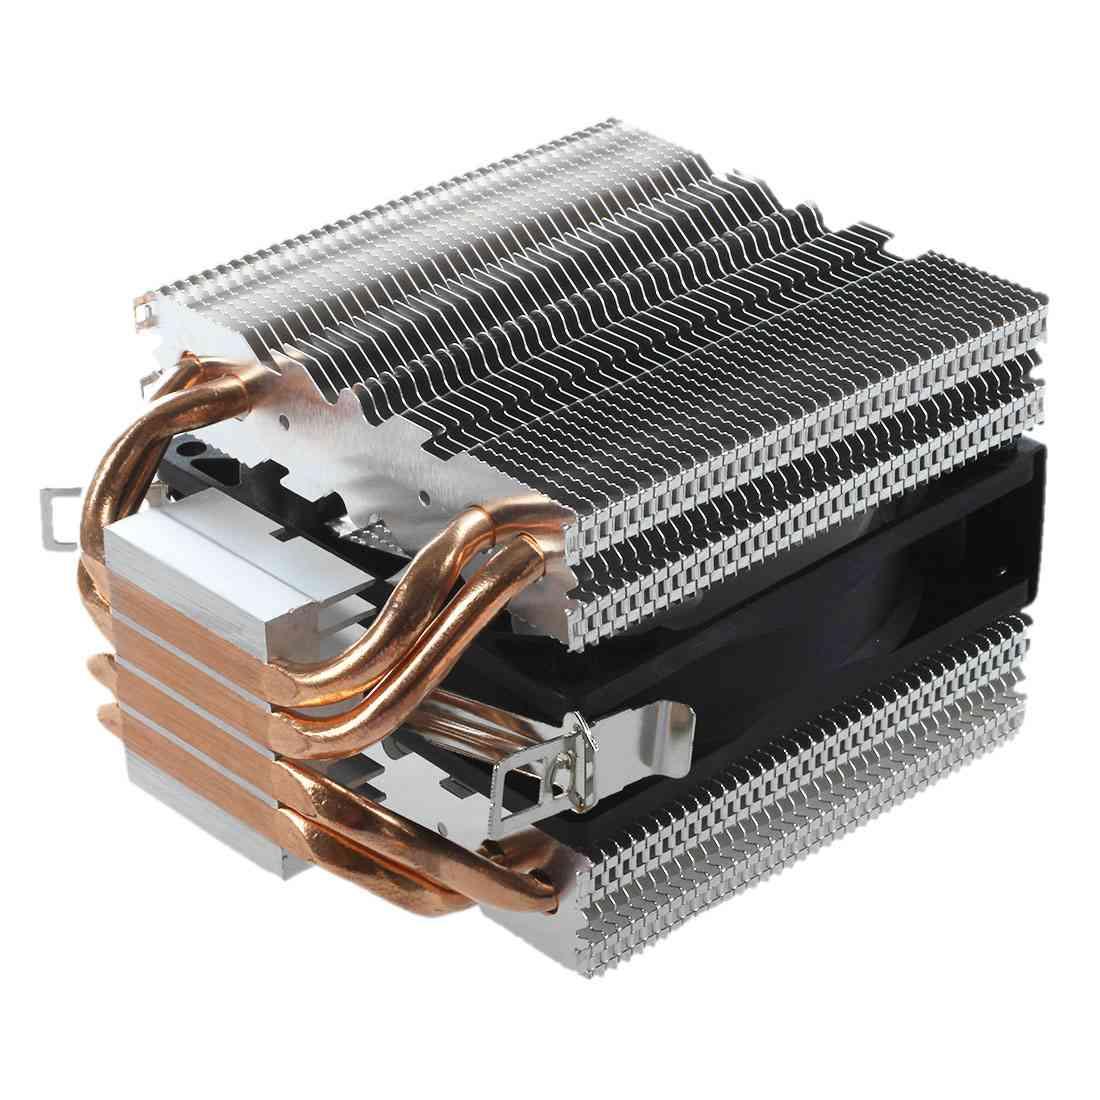 XEON E5450 EO SLBBM CPU 3 0GHz /L2 Cache 12MB/Quad Core//FSB